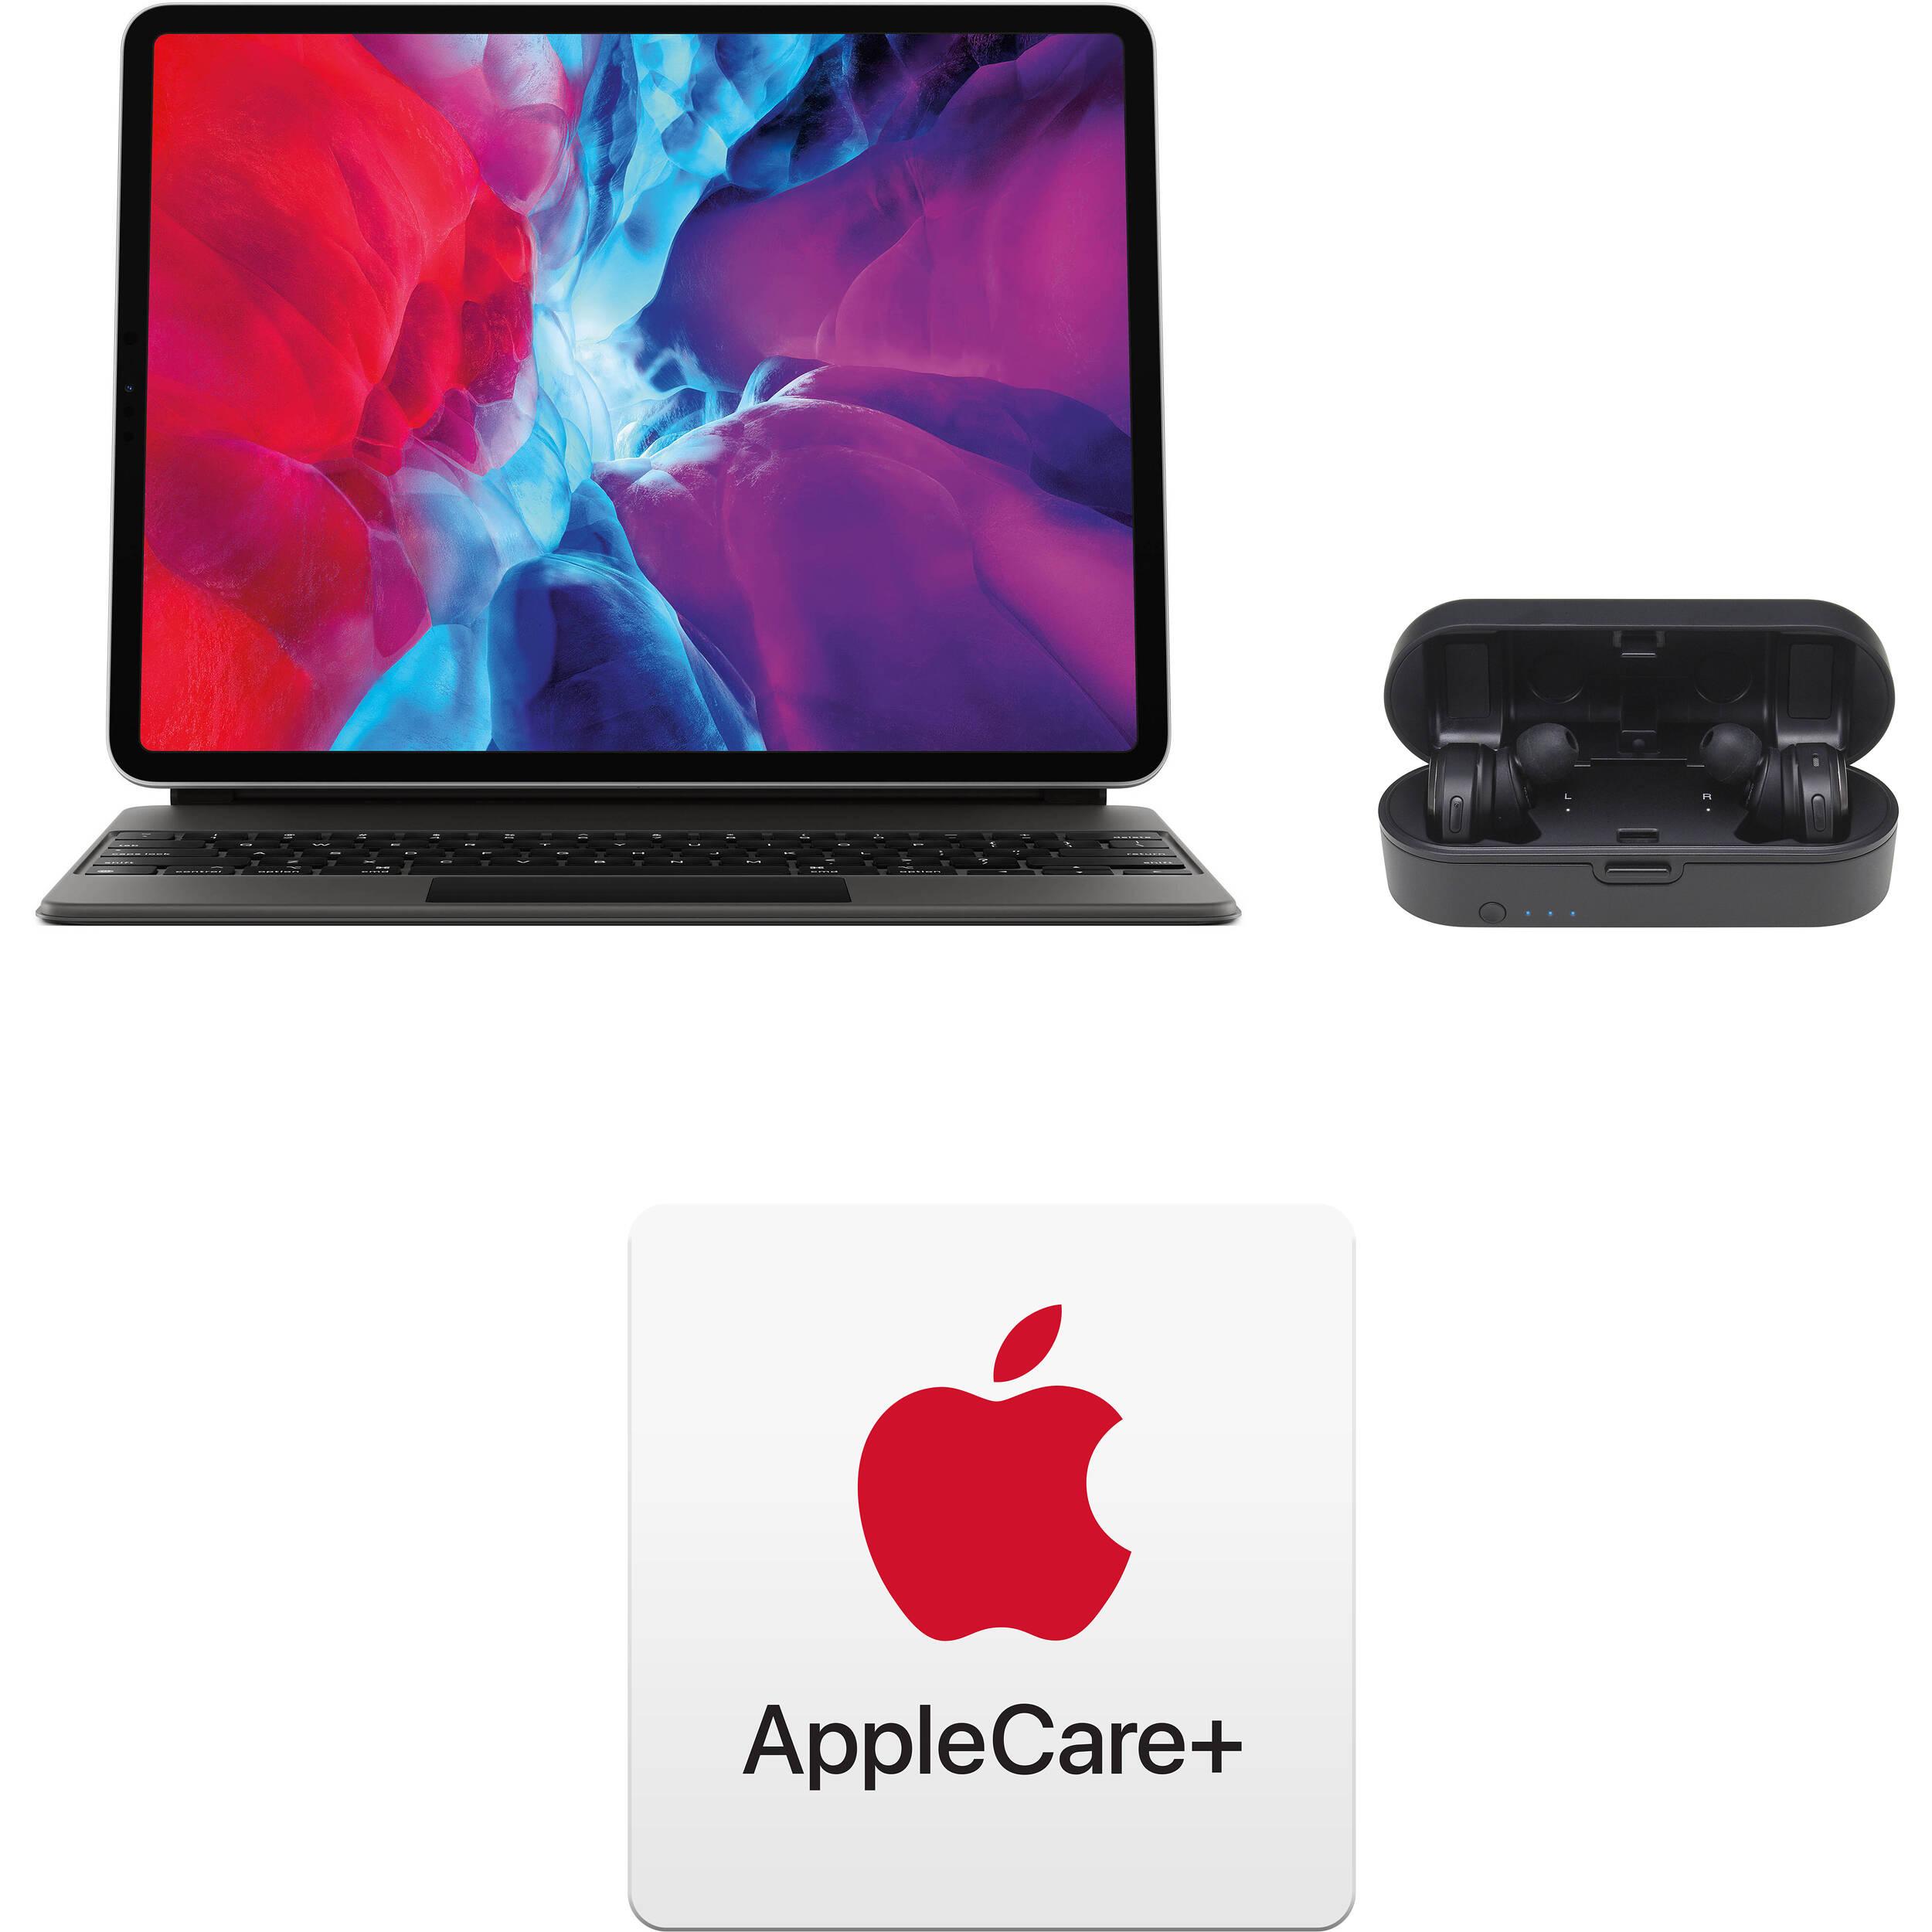 "Apple iPad Pro 12.9"" with Magic Keyboard and AppleCare+"